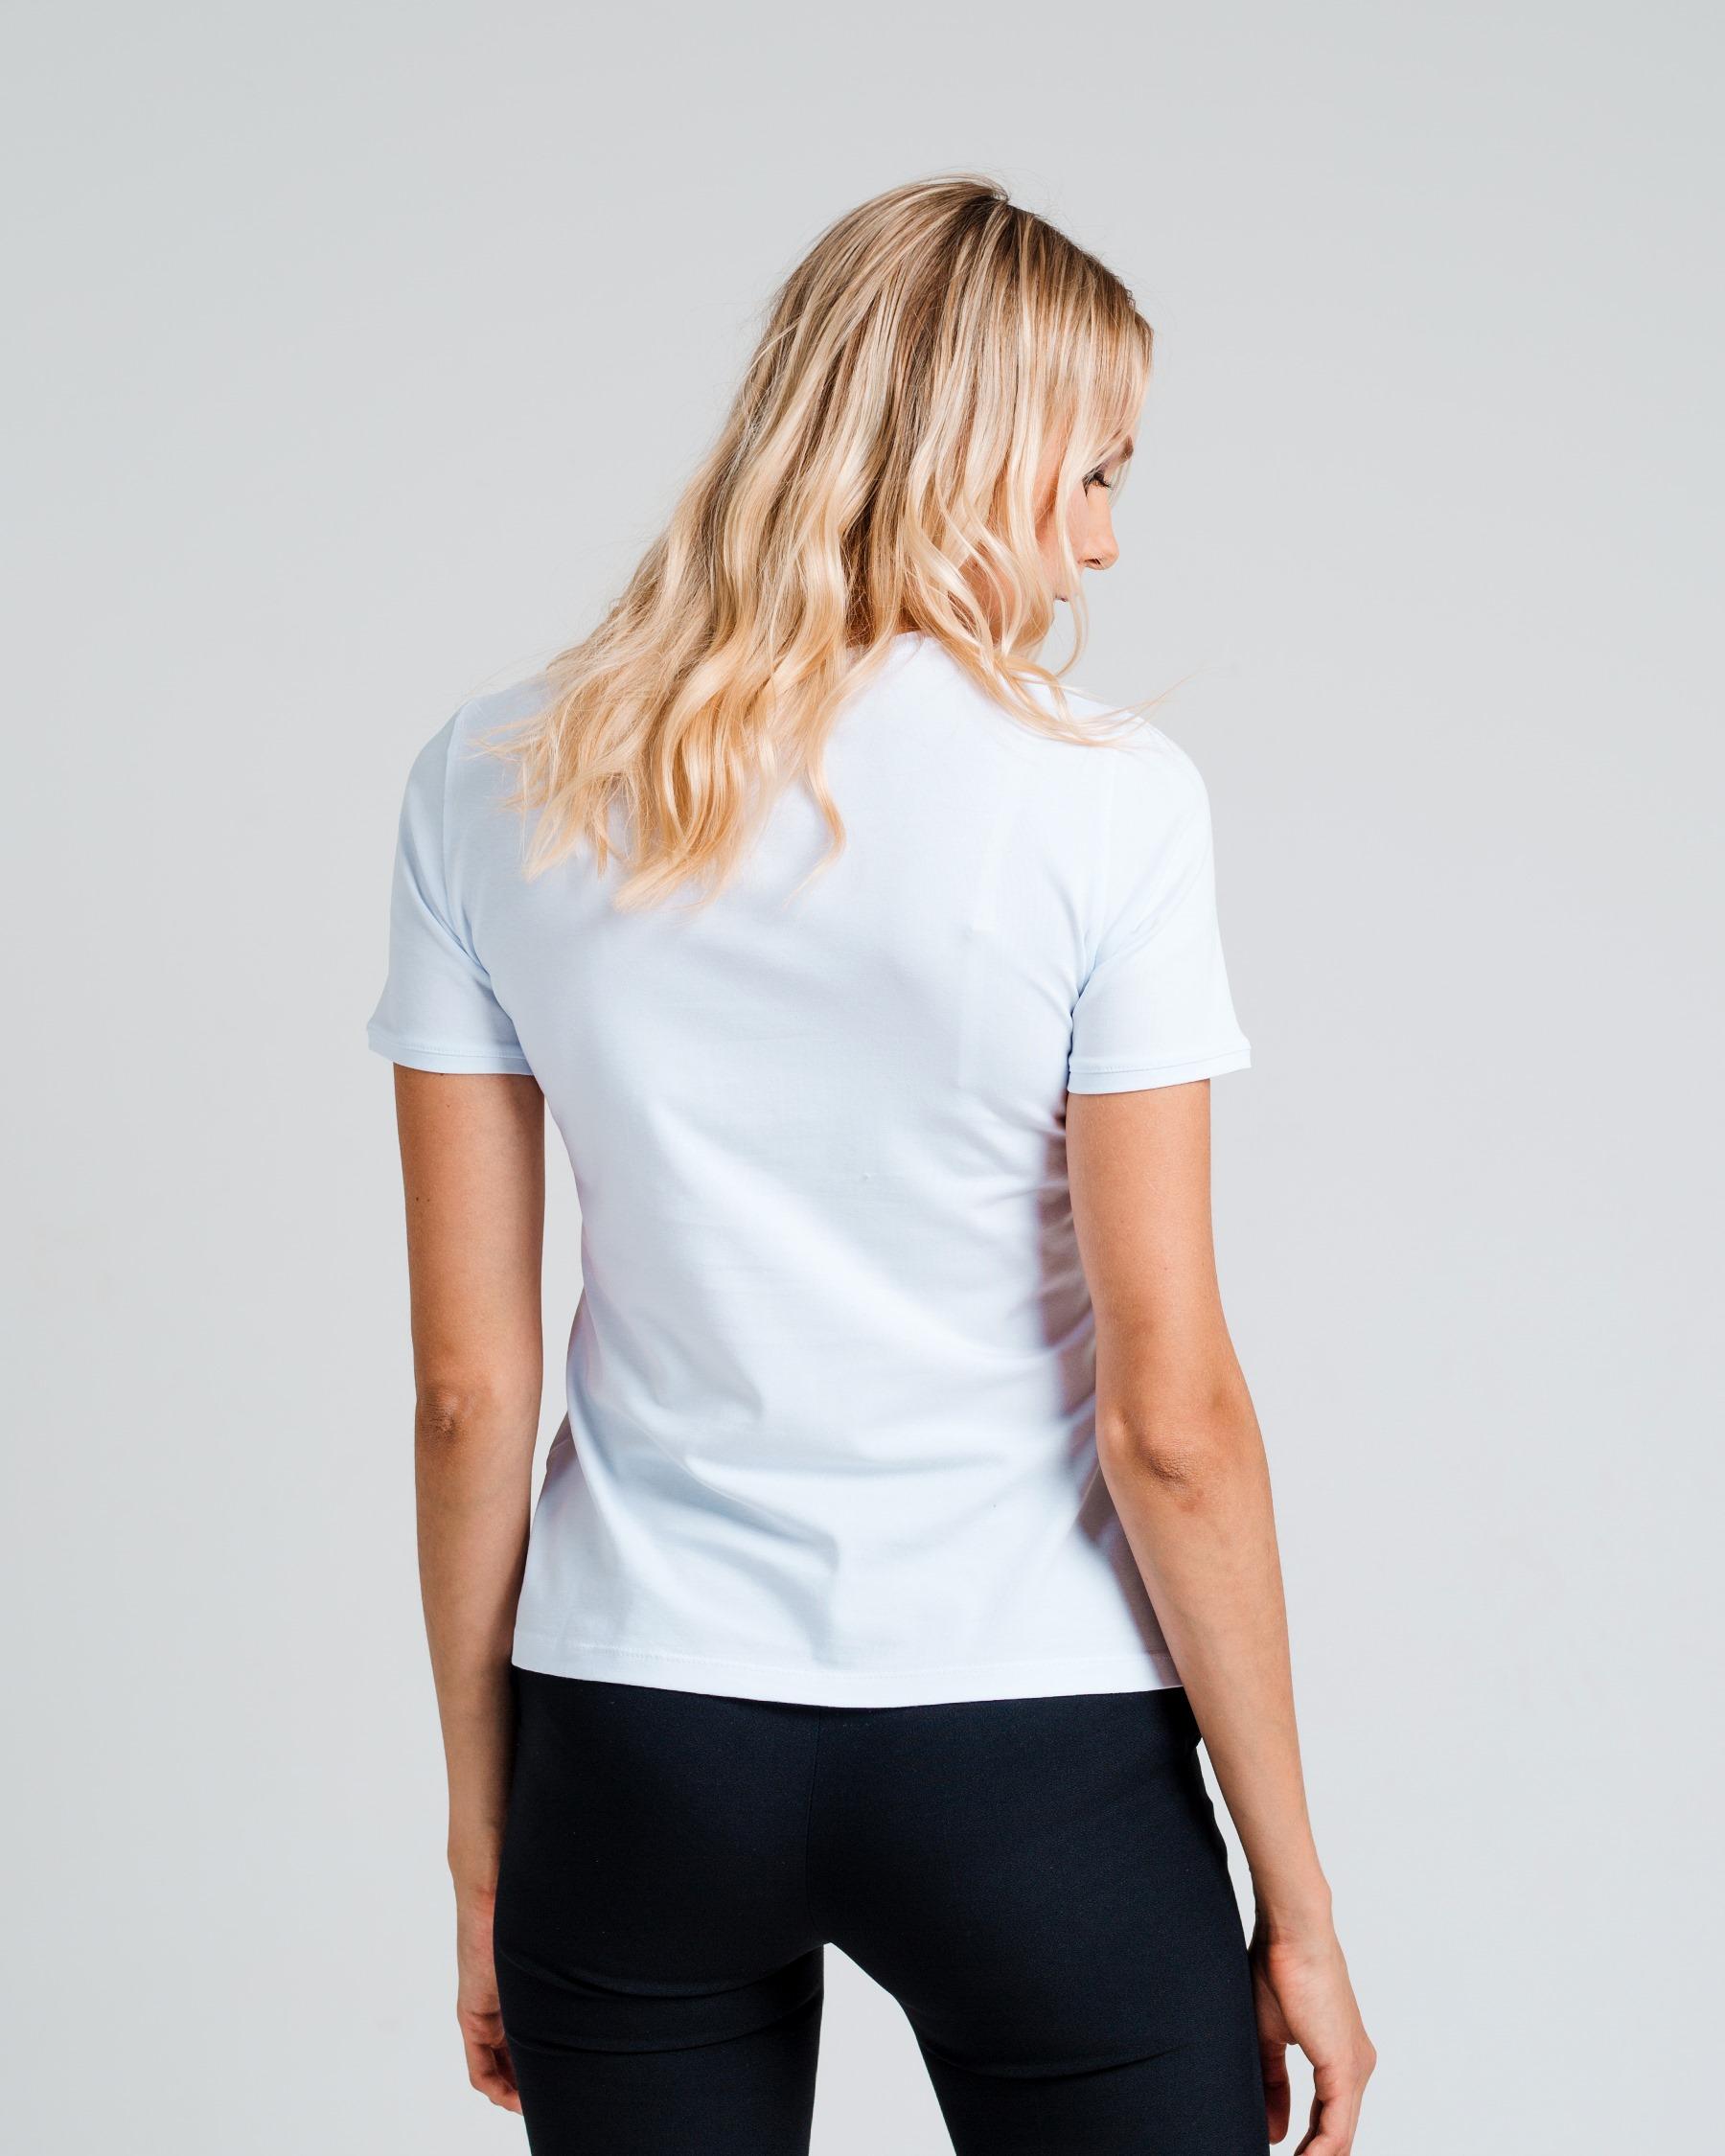 Узкая футболка с вышивкой Цветок